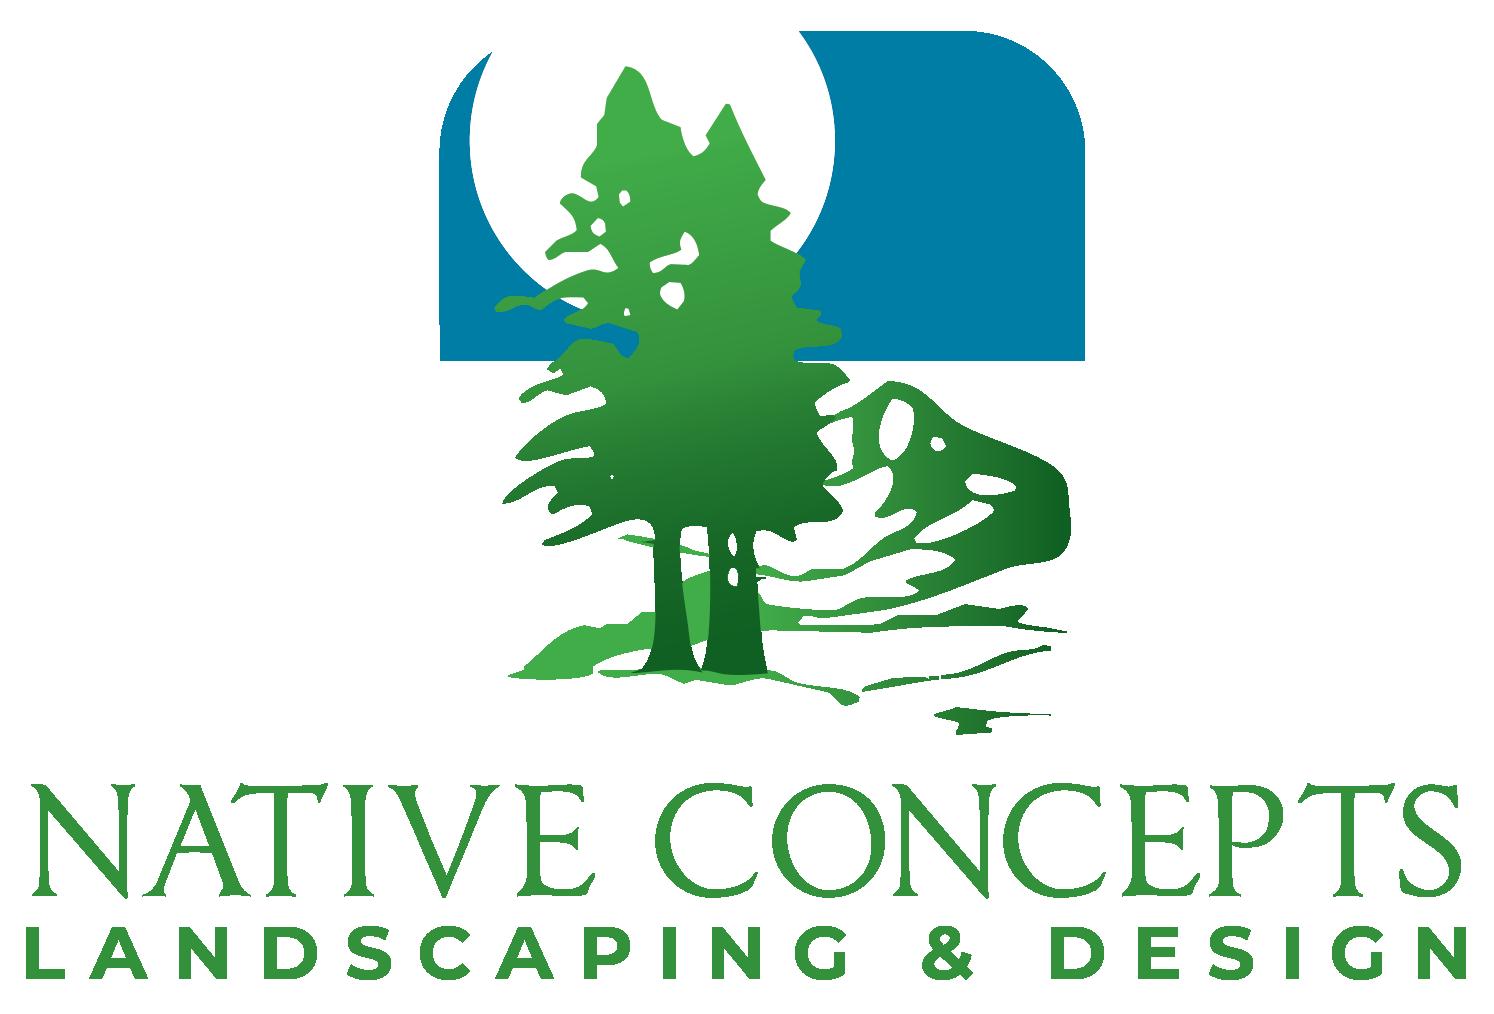 Native Concepts